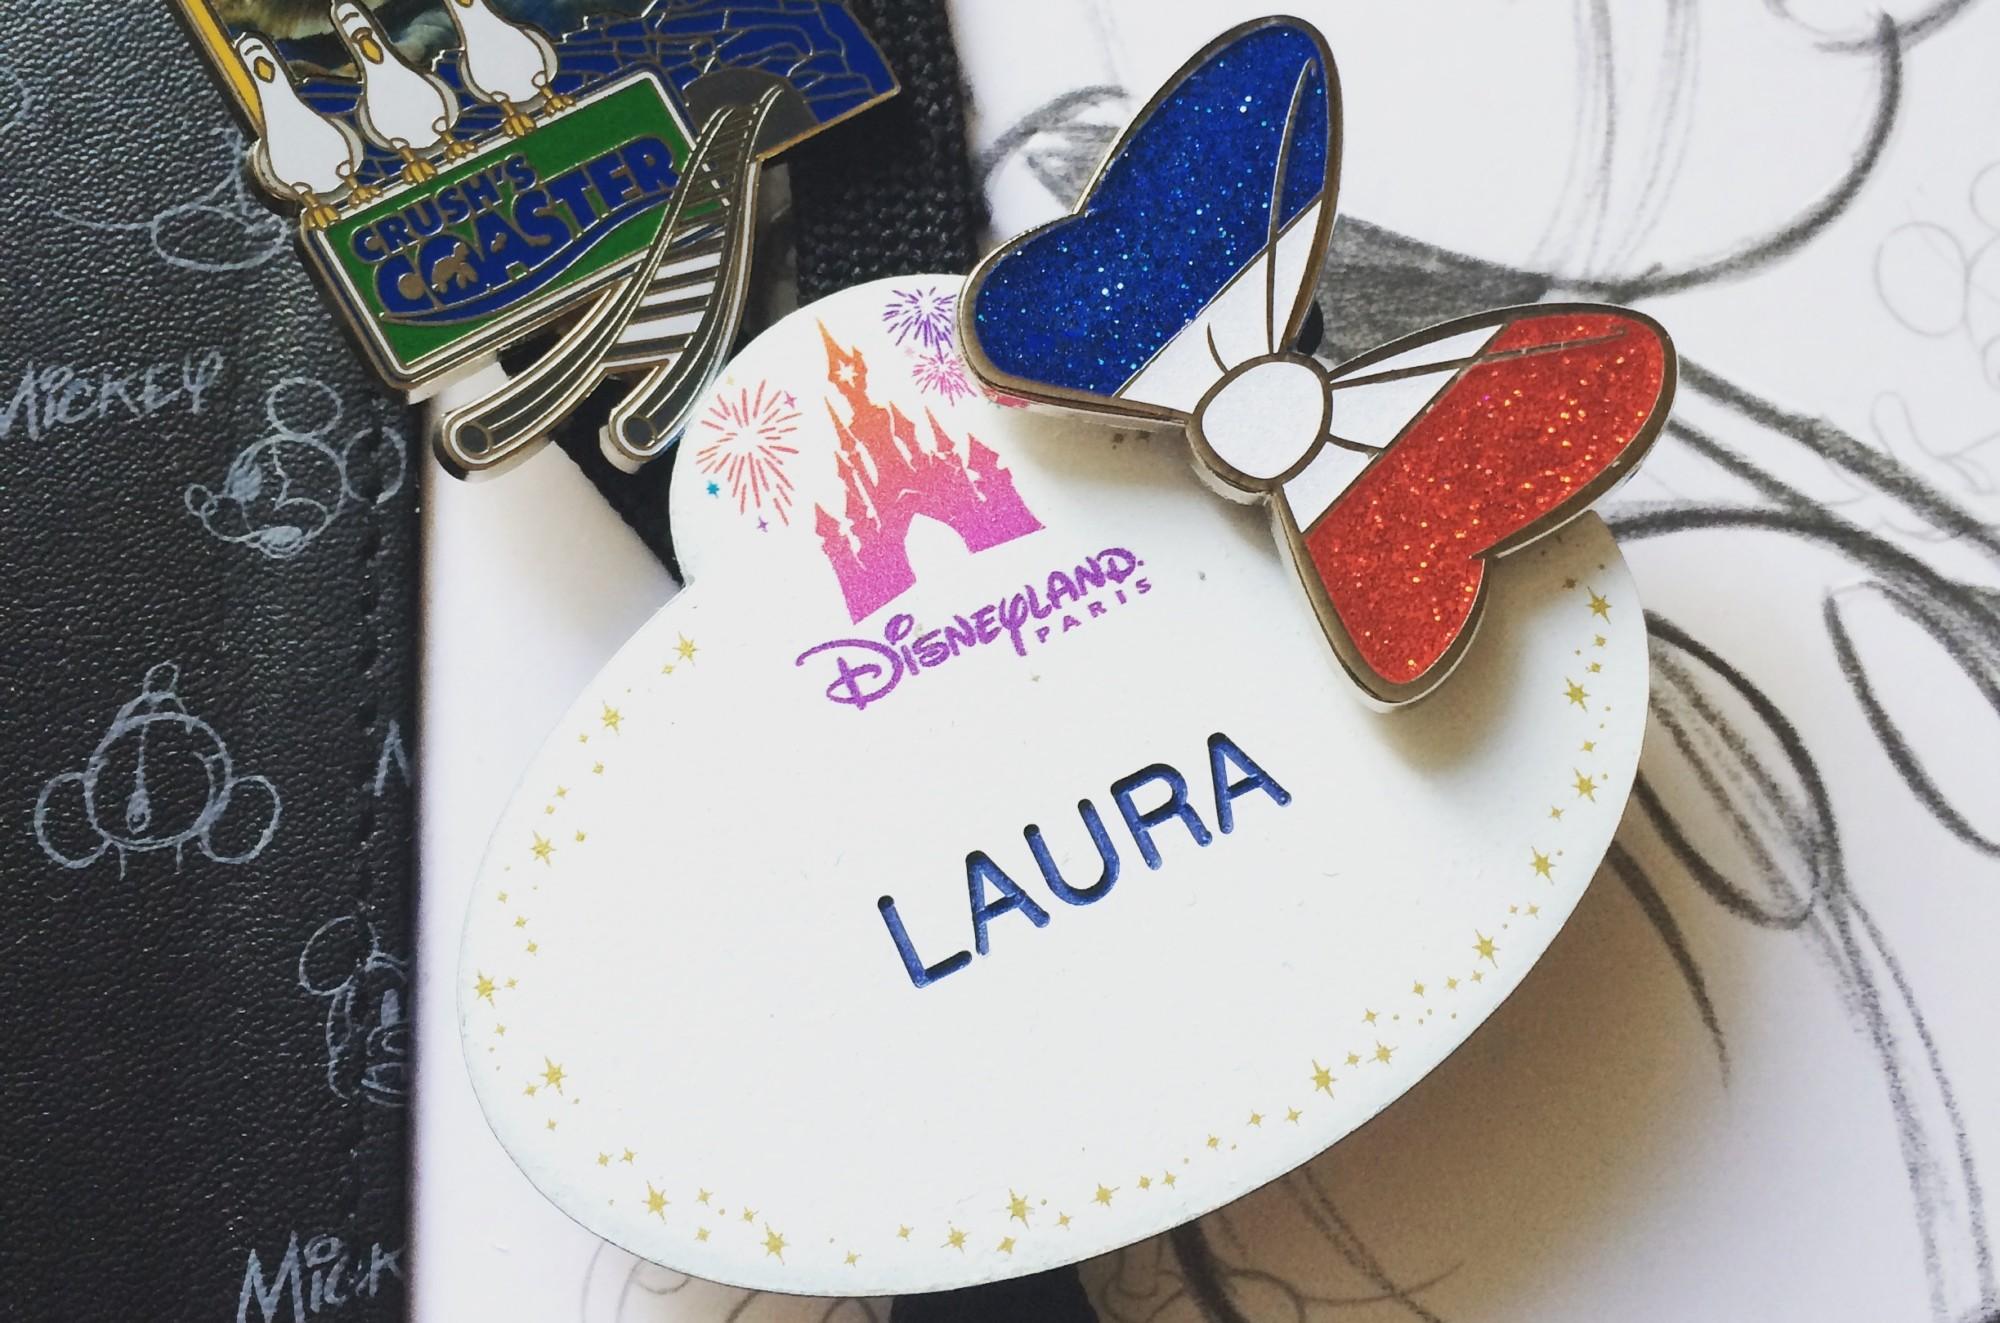 Travailler à Disneyland Paris -